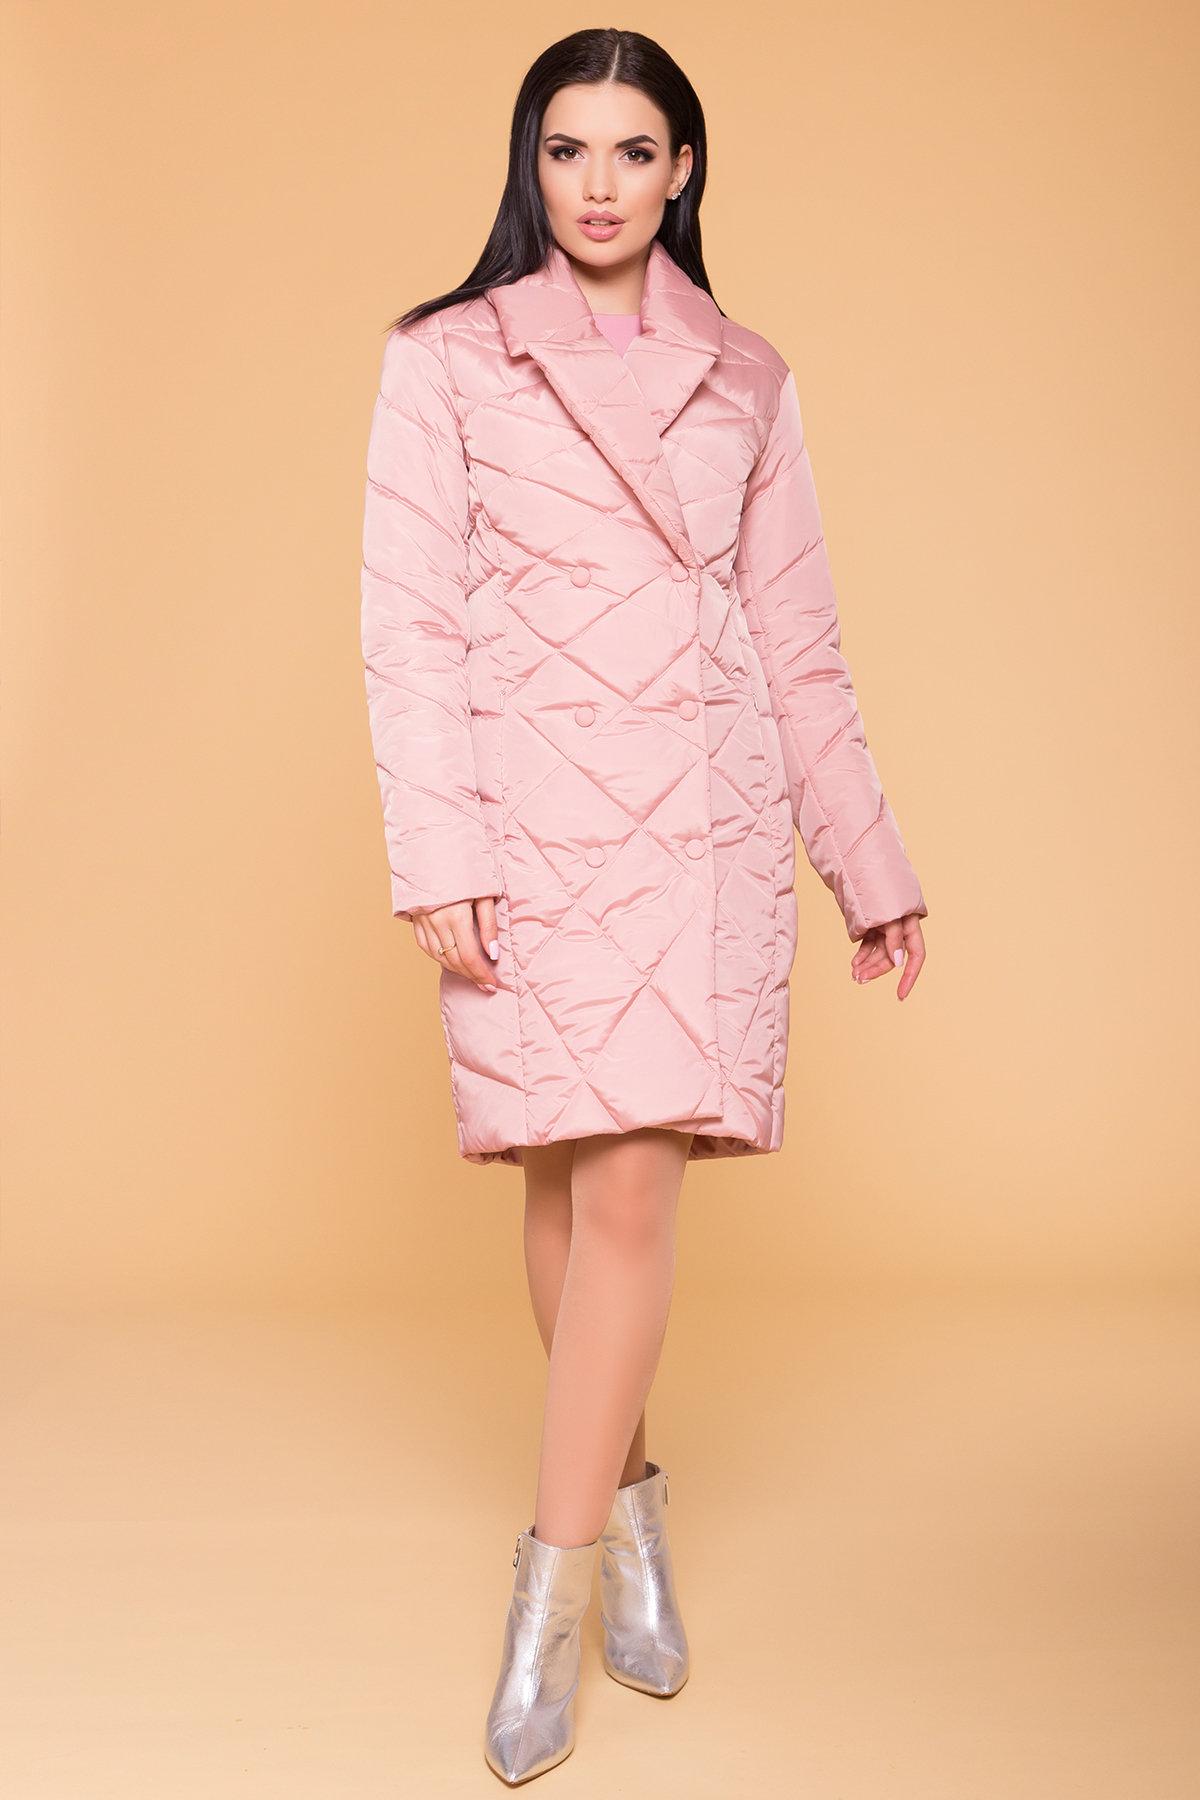 Пальто Сандра 6422 АРТ. 41356 Цвет: Пудра - фото 4, интернет магазин tm-modus.ru